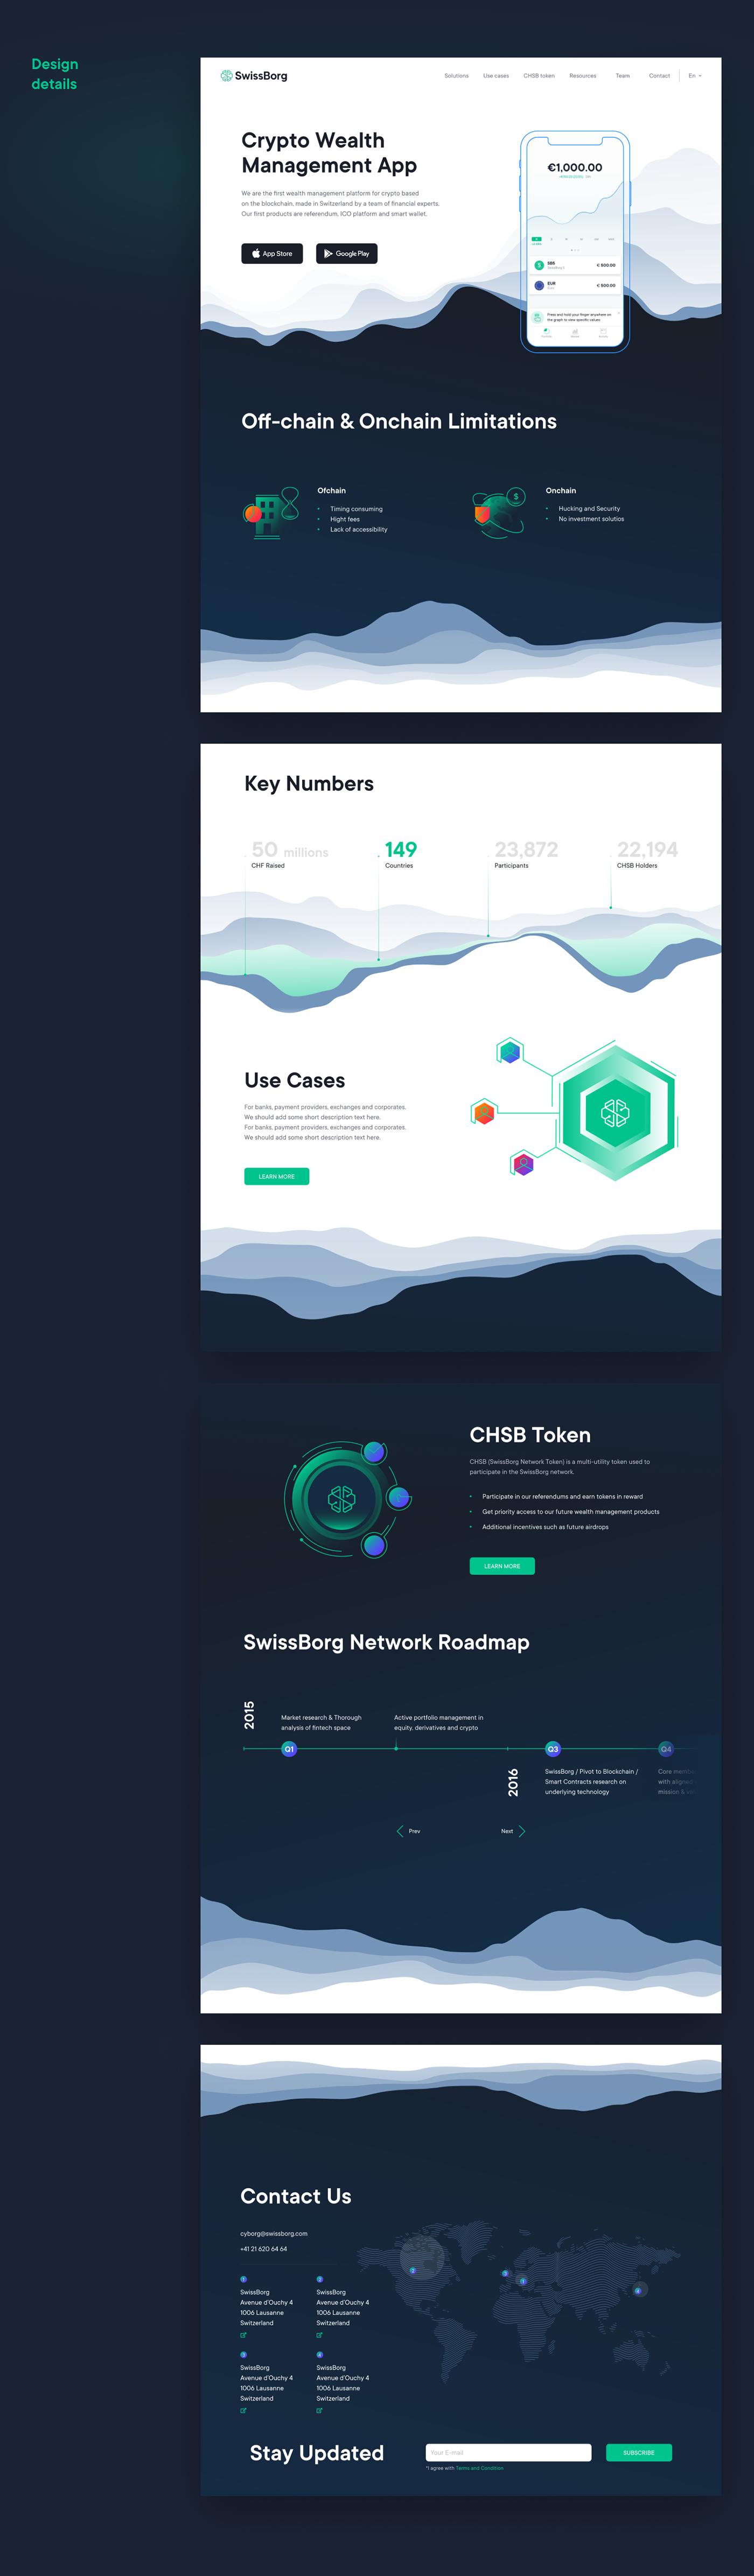 crypto Website Ico Platform animation  ILLUSTRATION  ui design UX design blockchain WALLET